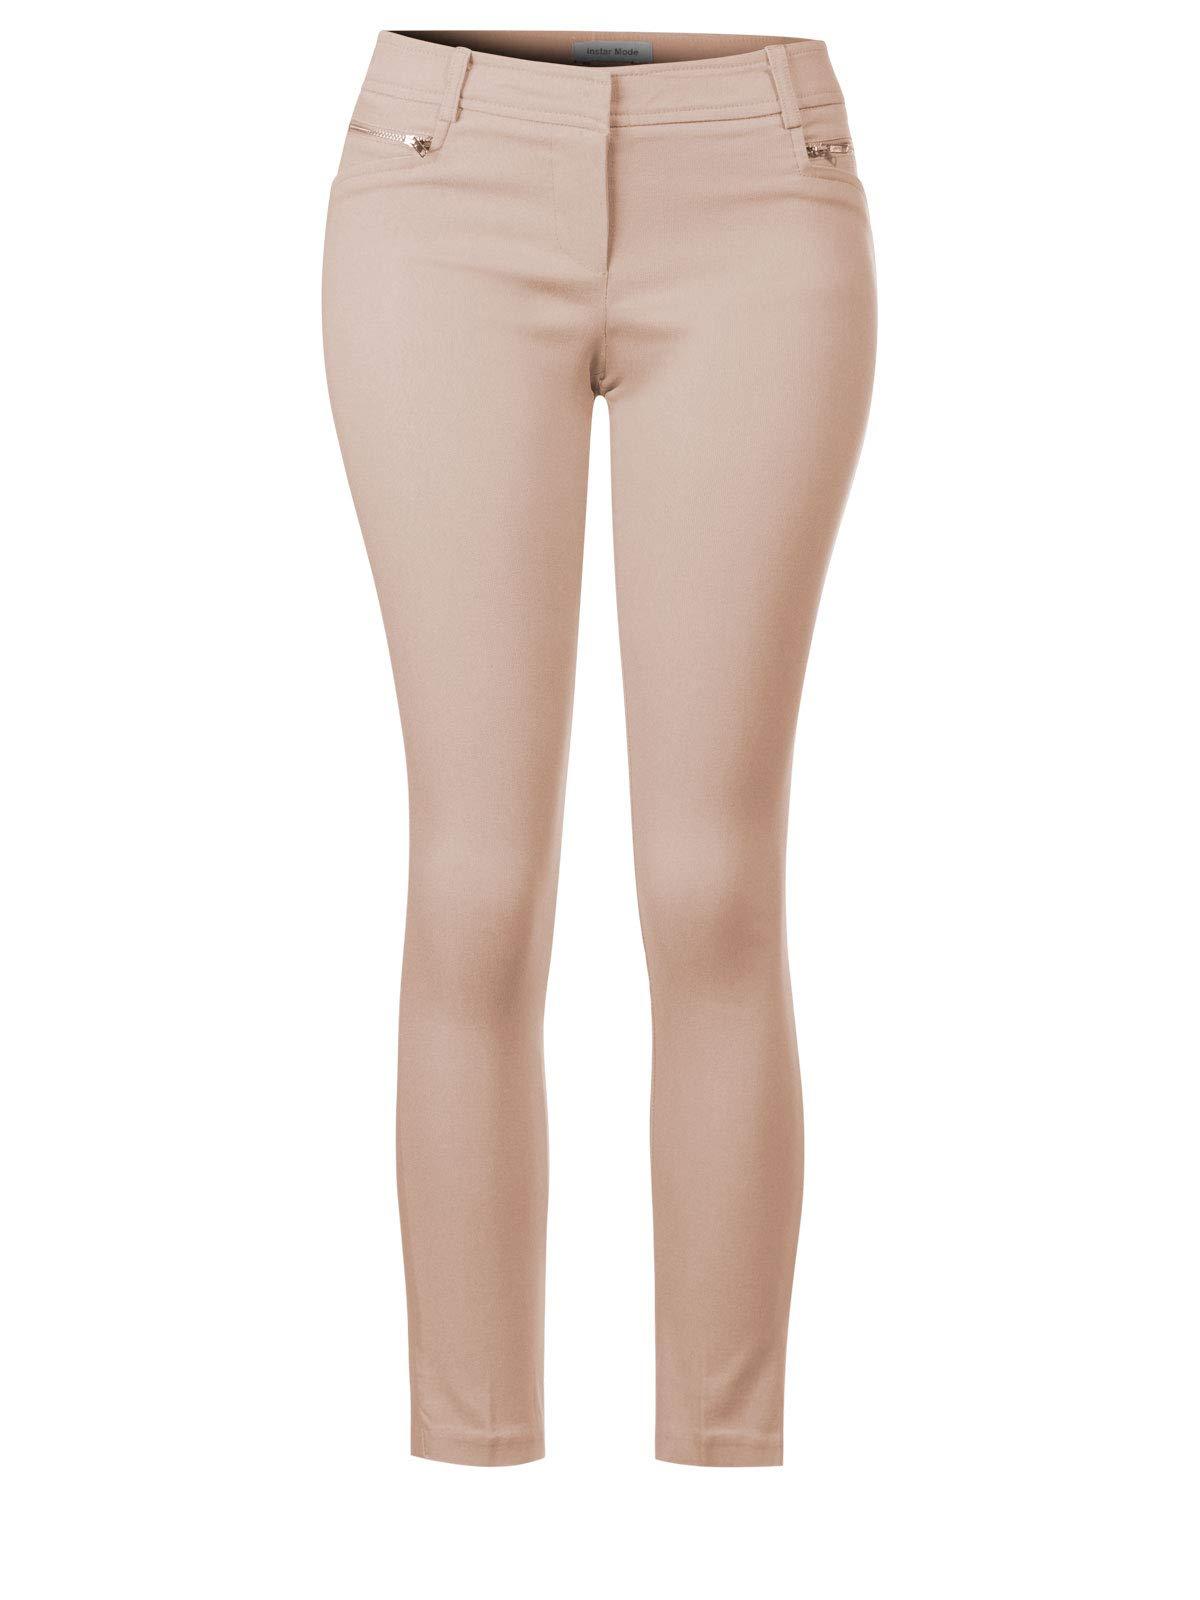 Instar Mode Women's Solid Full Length Formal Pants Khaki 2XL